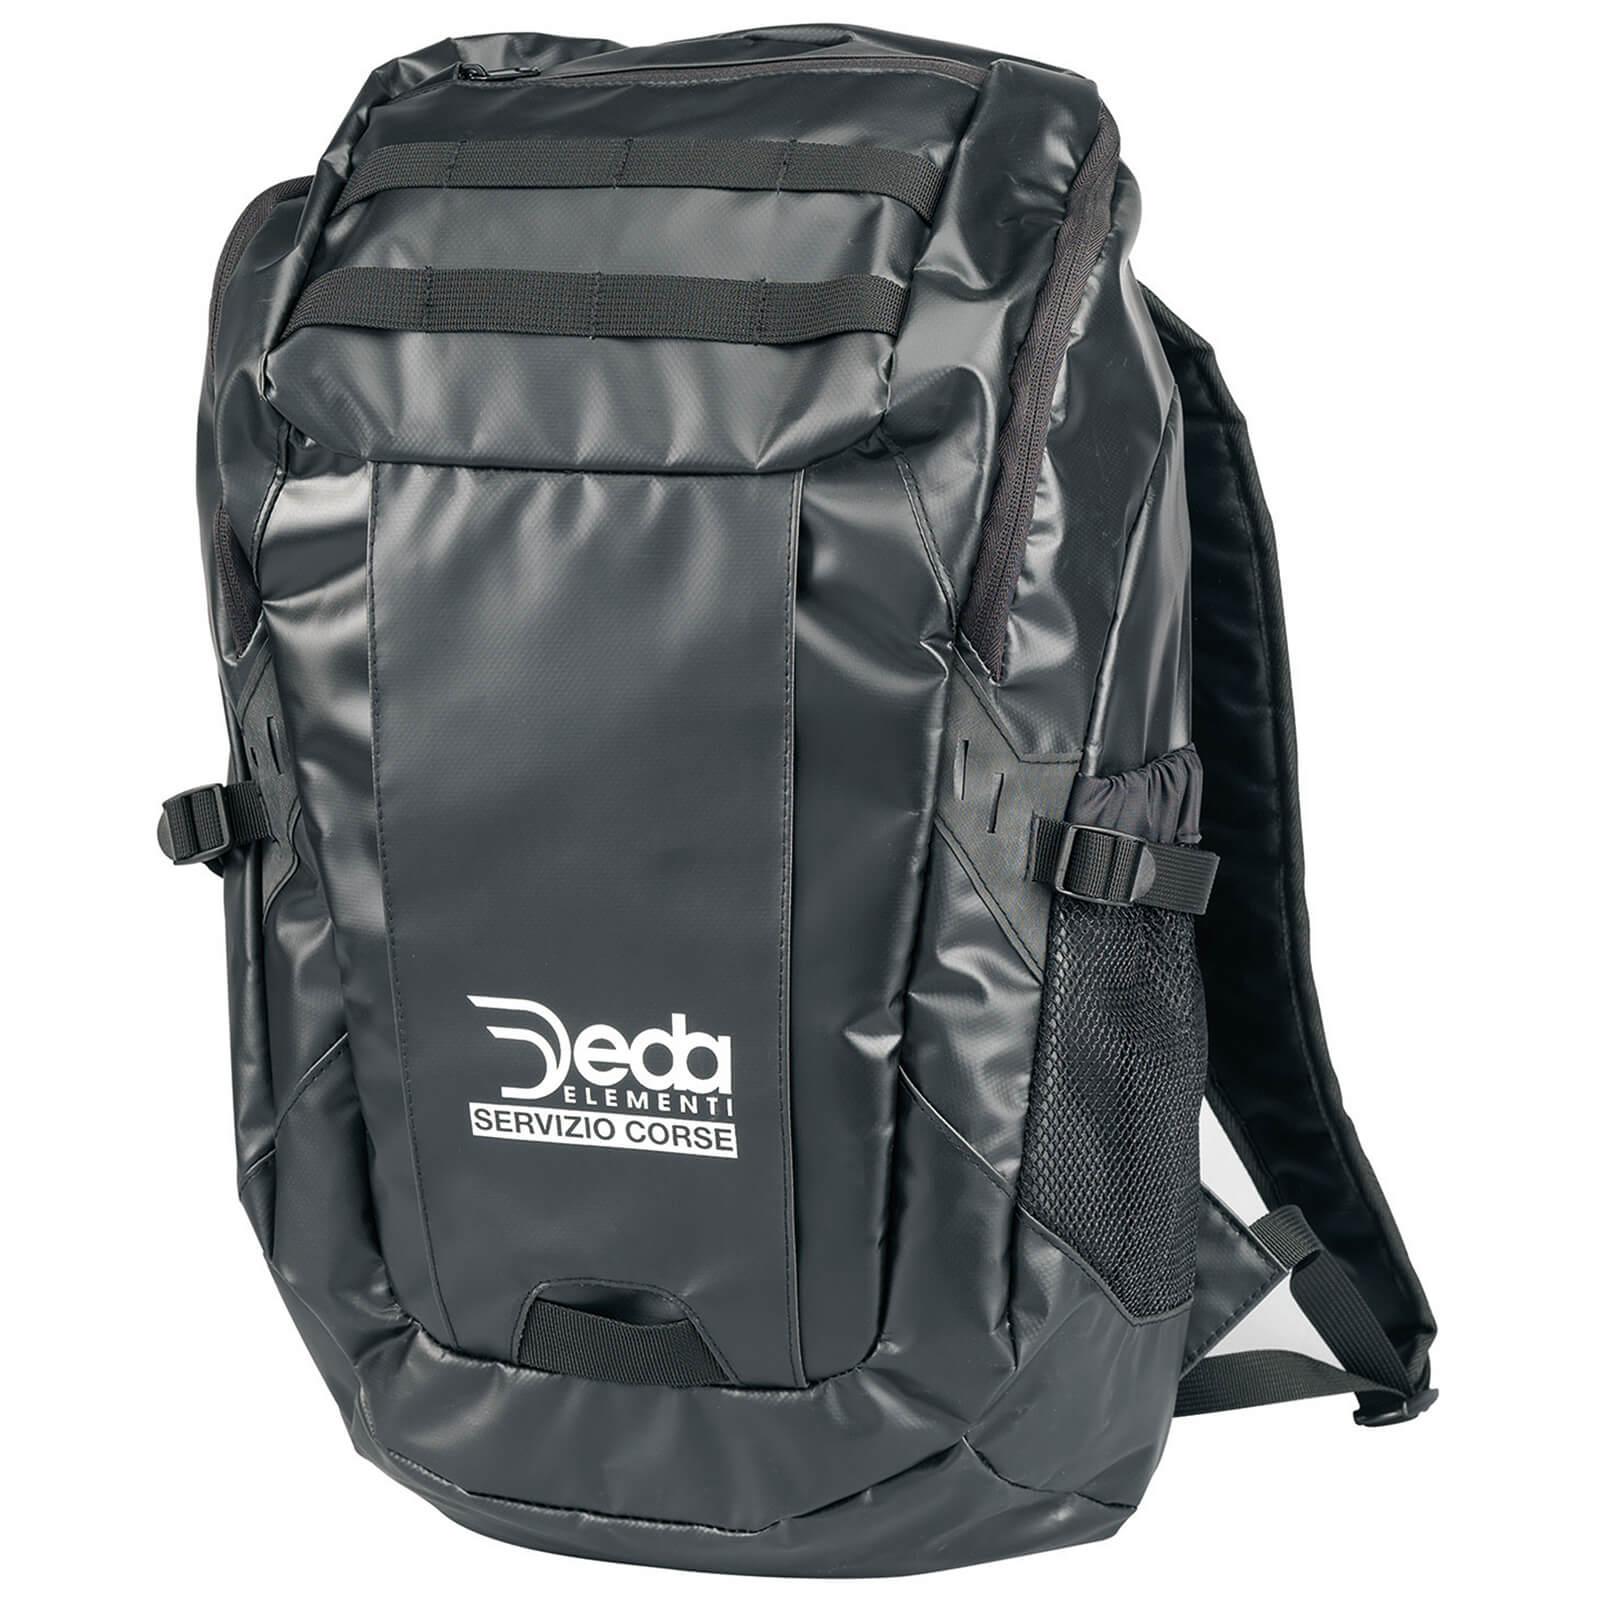 Deda Backpack - Black